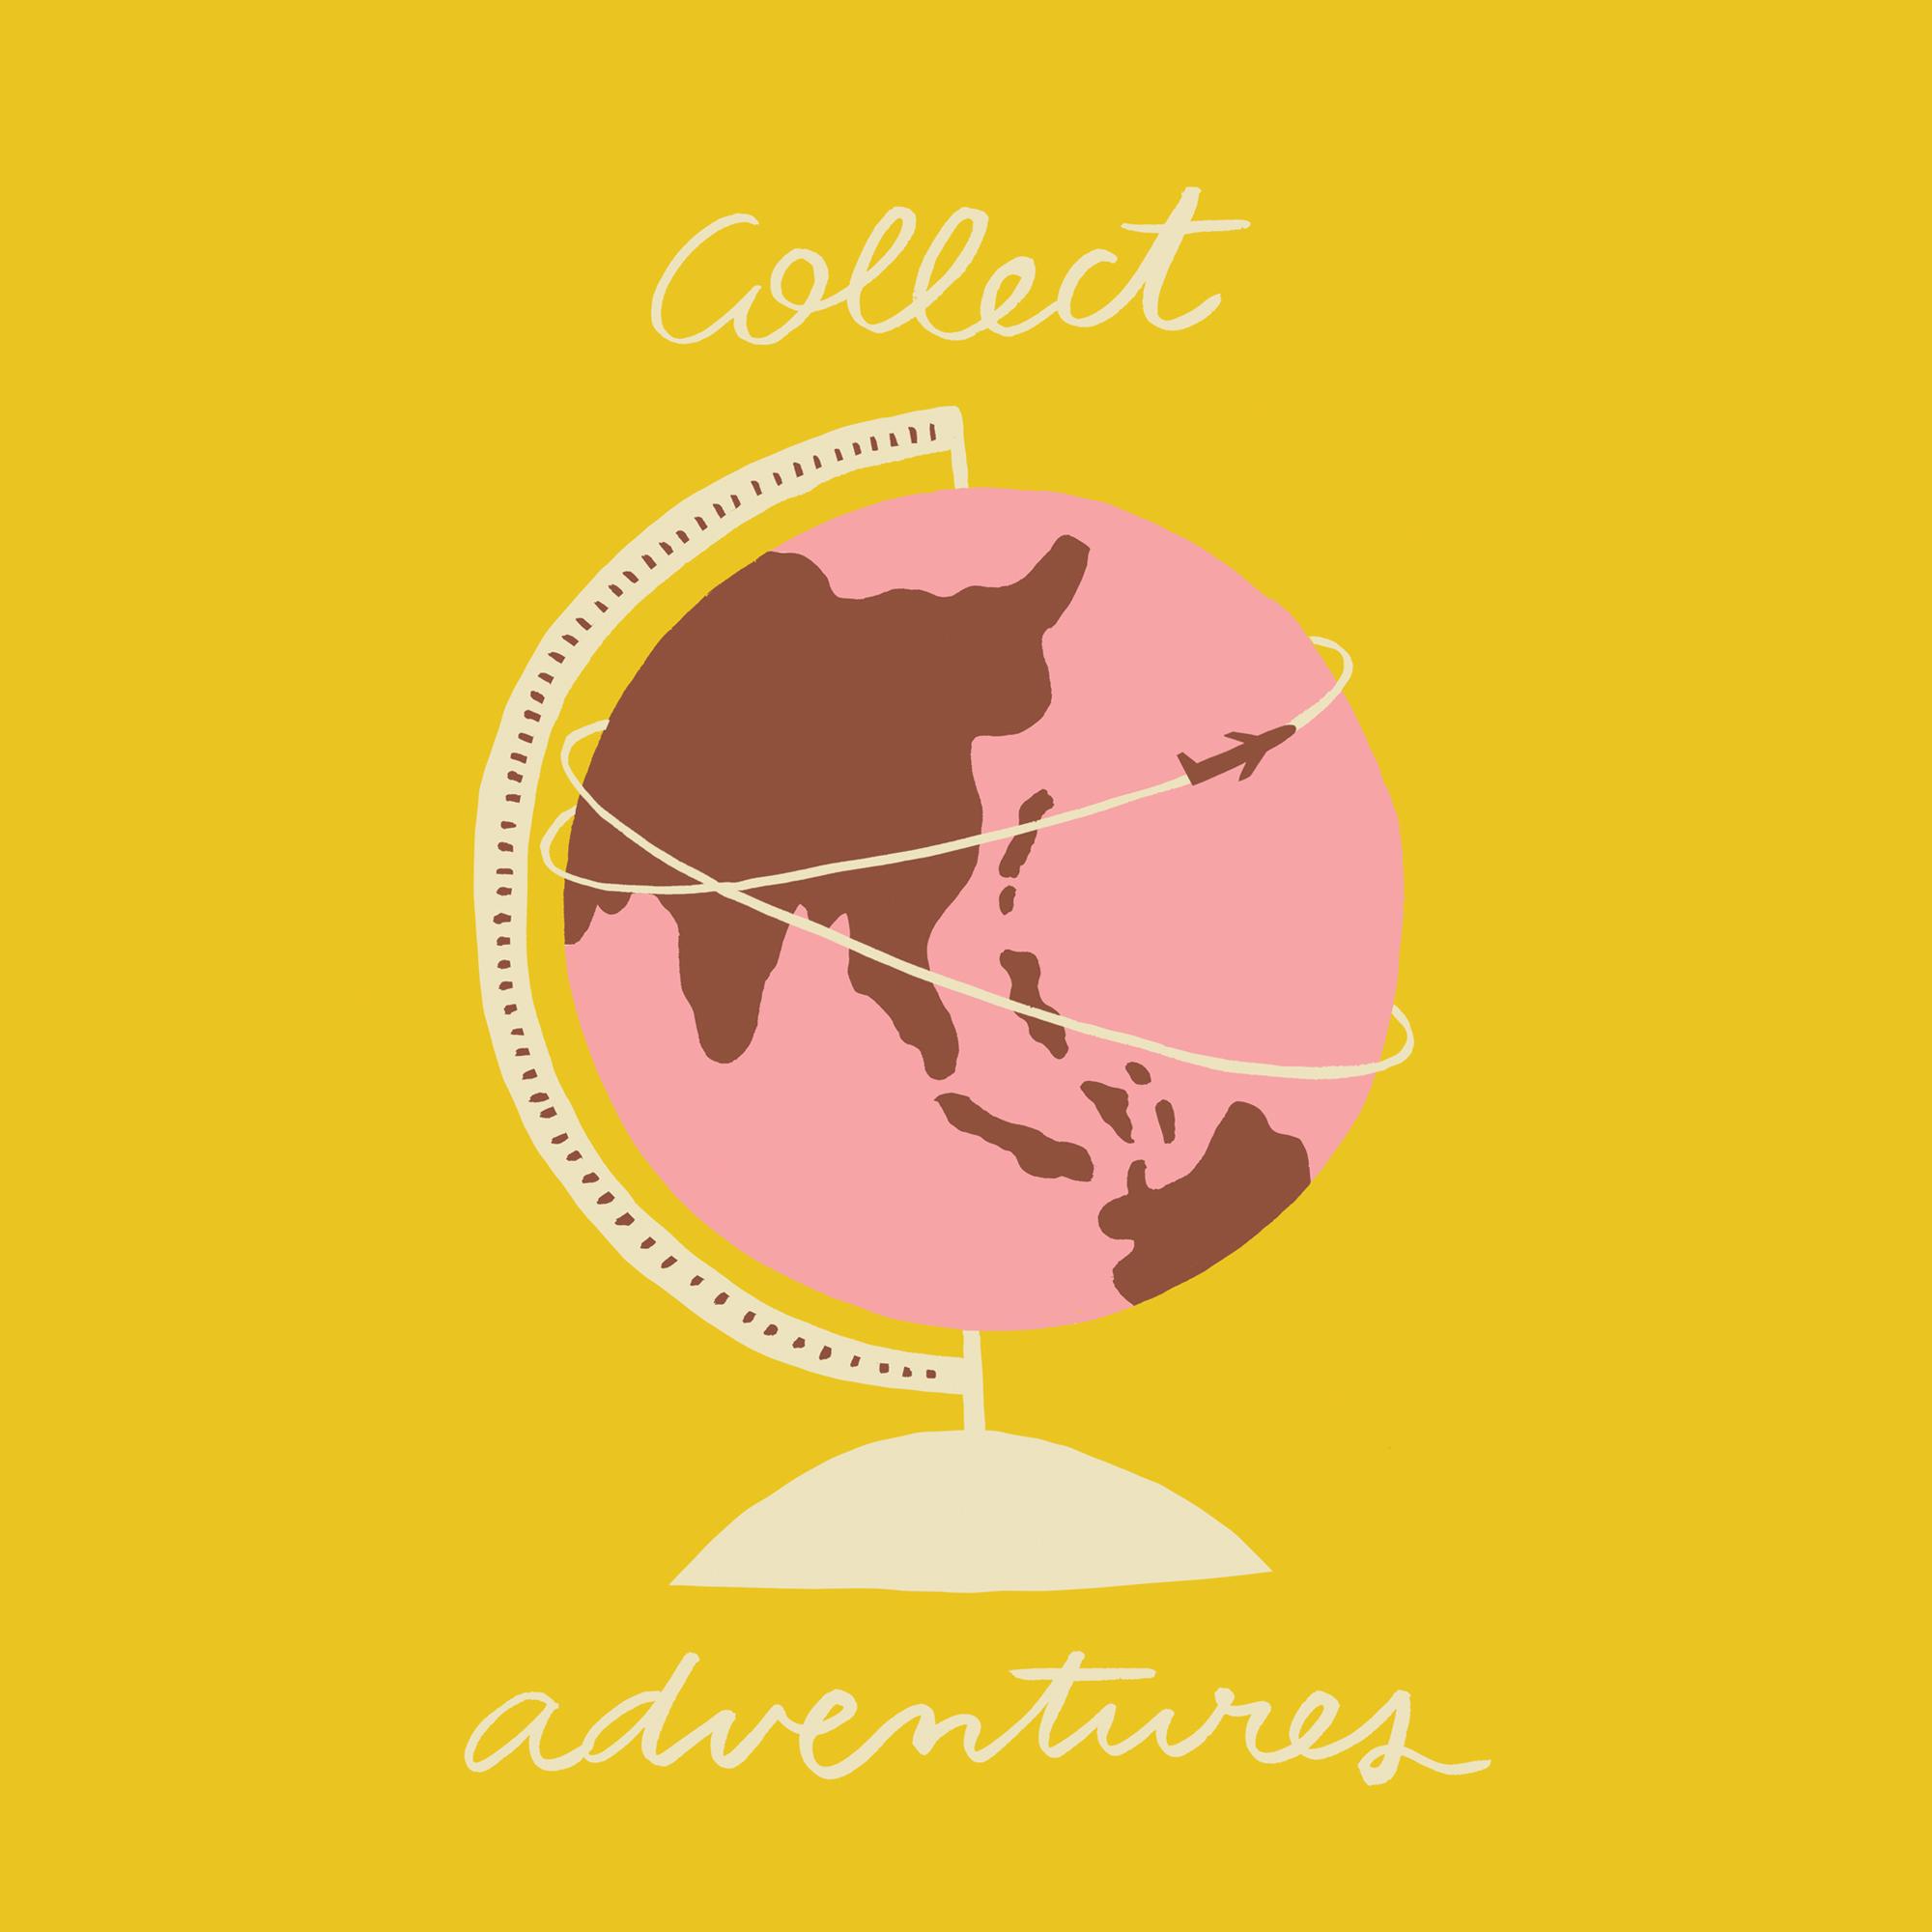 Collect adventures_1.jpg